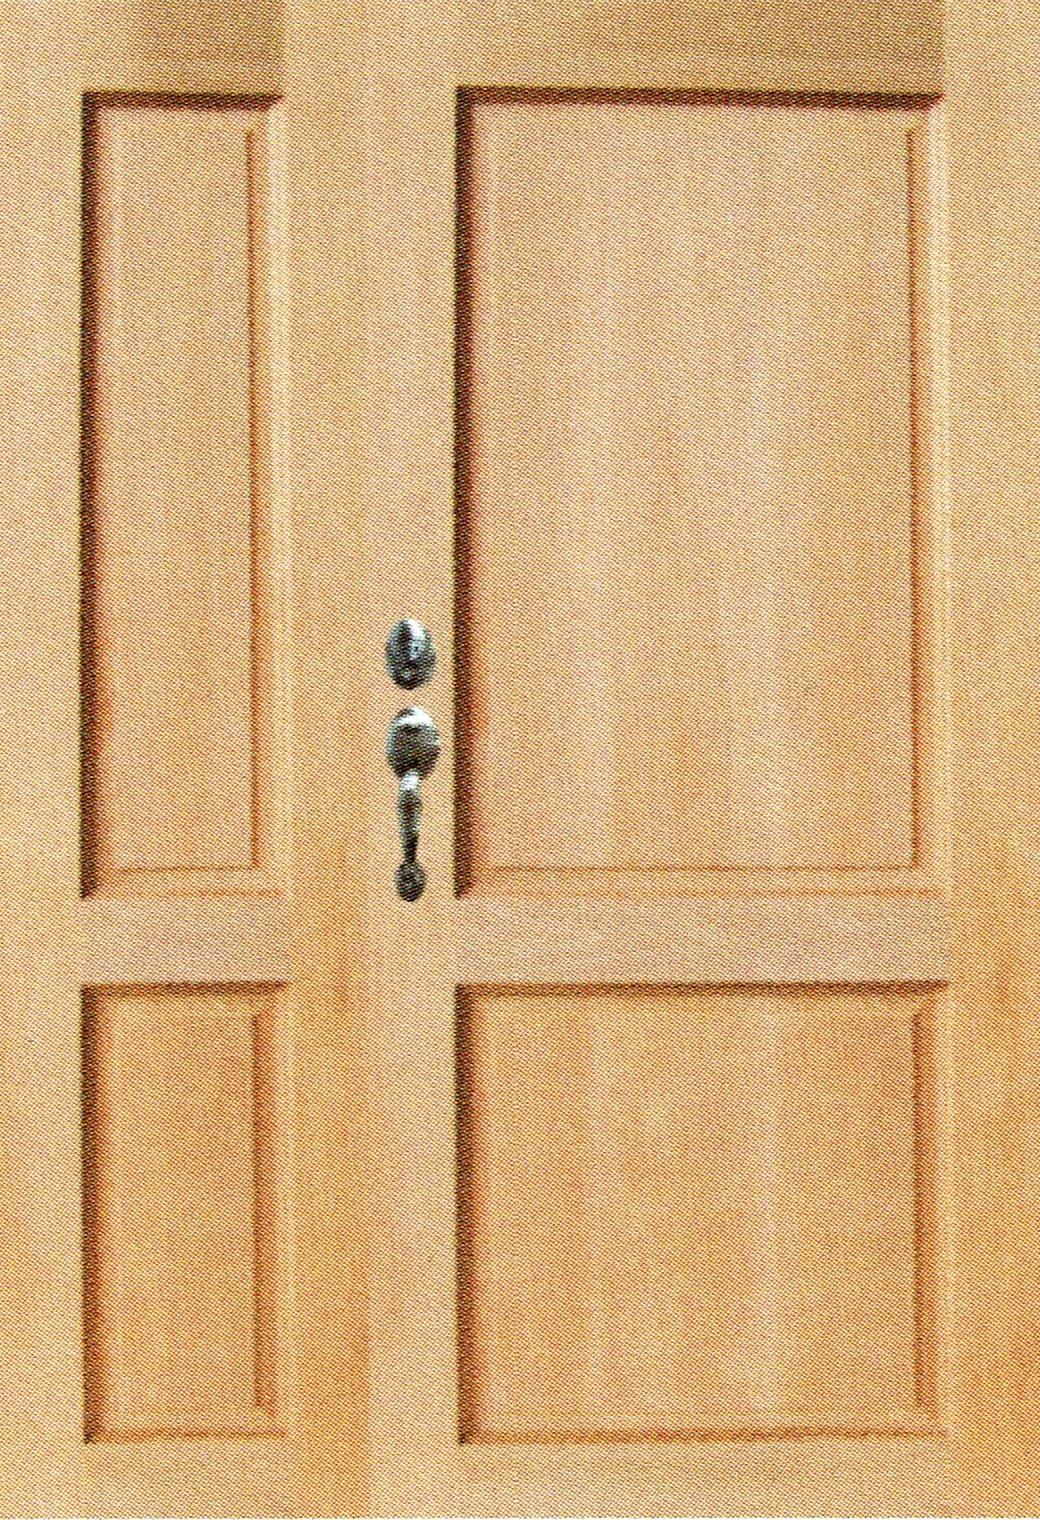 ST 32D(Solid Timber Door (Double Leaf Unequal Leaf))